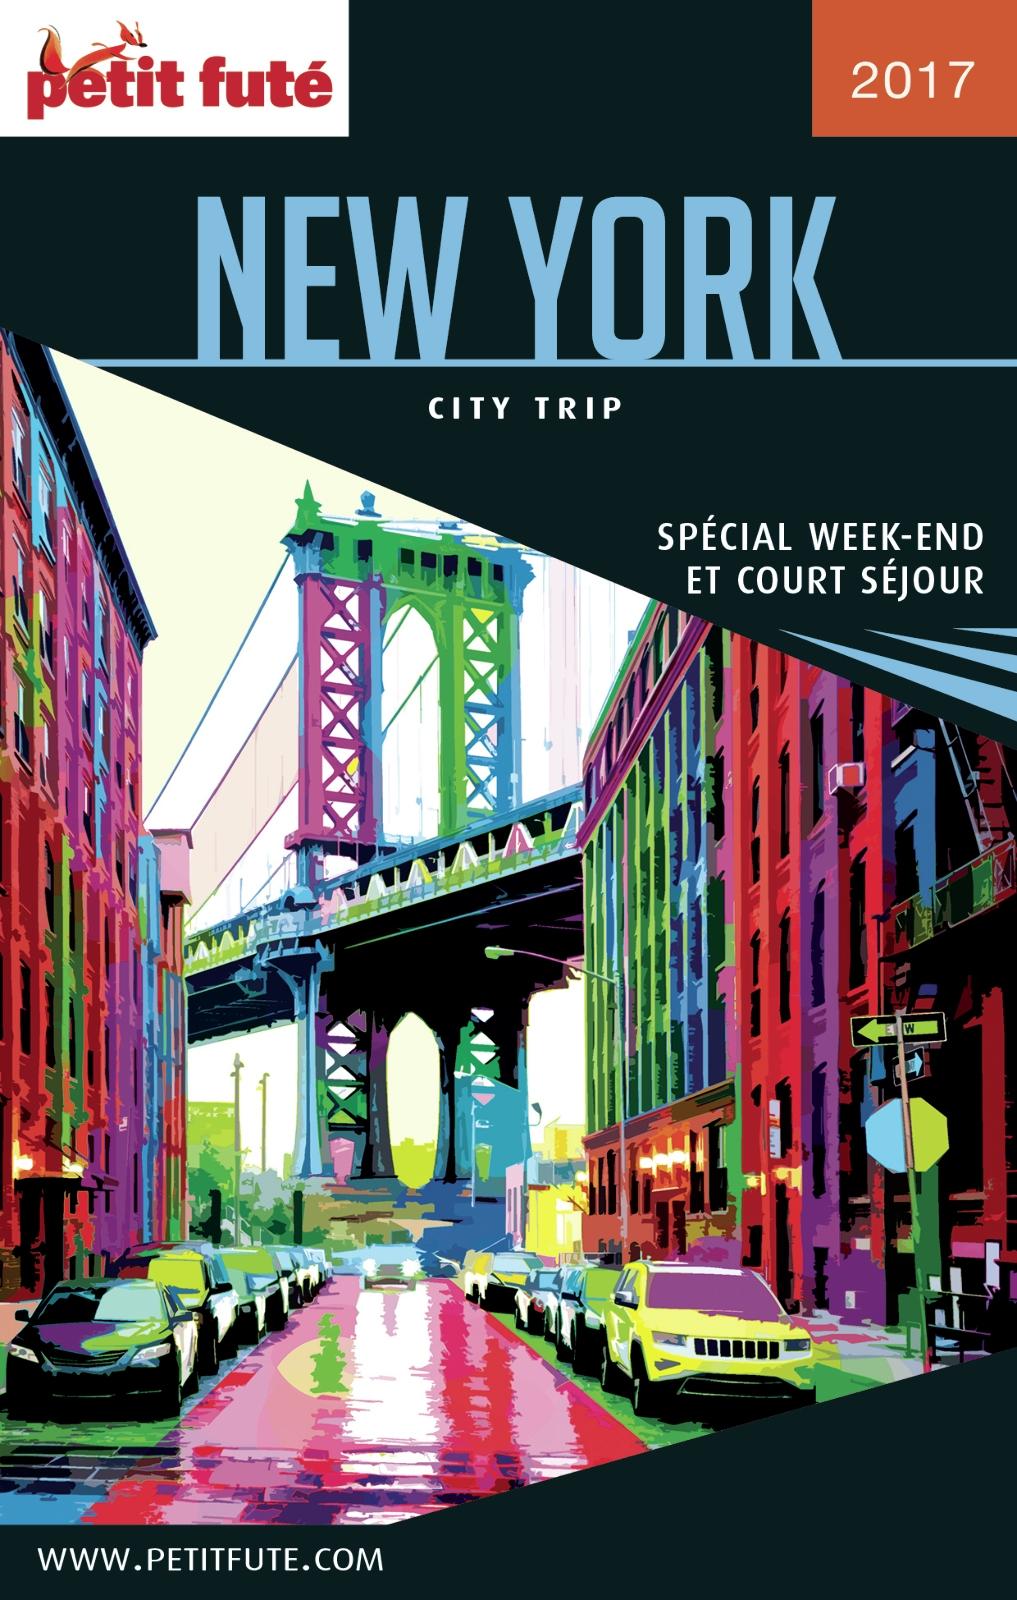 NEW YORK CITY TRIP 2017 City trip Petit Futé